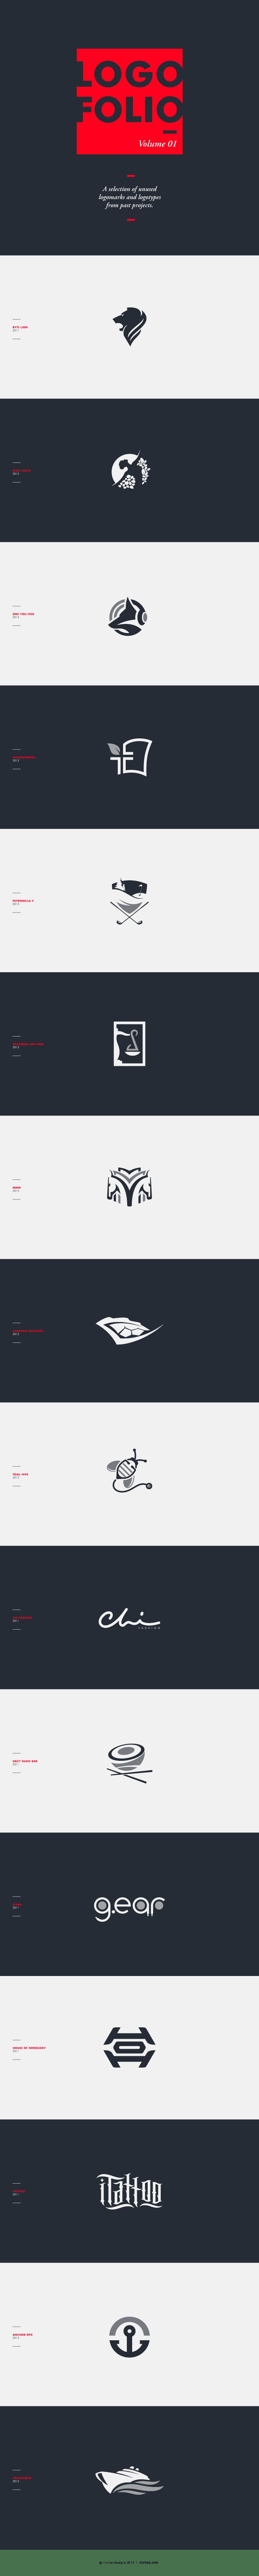 Logos-v1